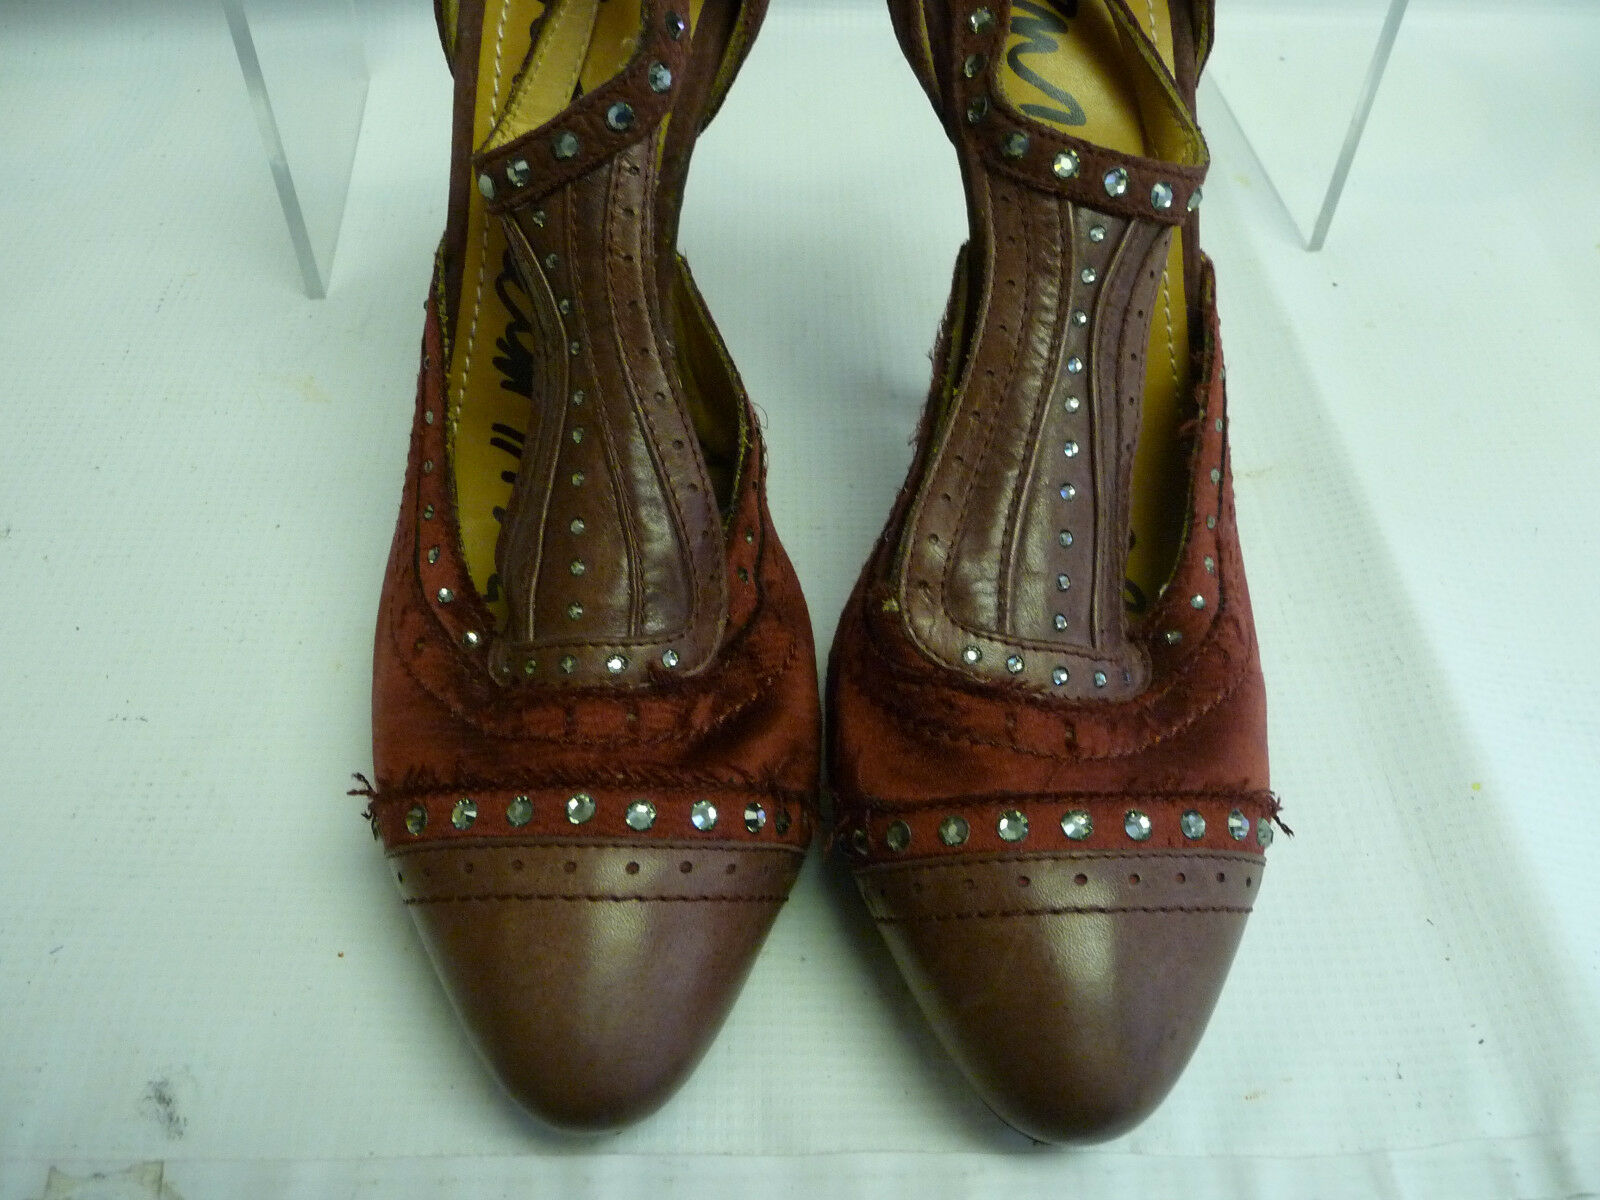 LANVIN LANVIN LANVIN damen Stilettos 40 10 Maroon Suede Satin Bling Captoe  Rubber Sole 5361c9